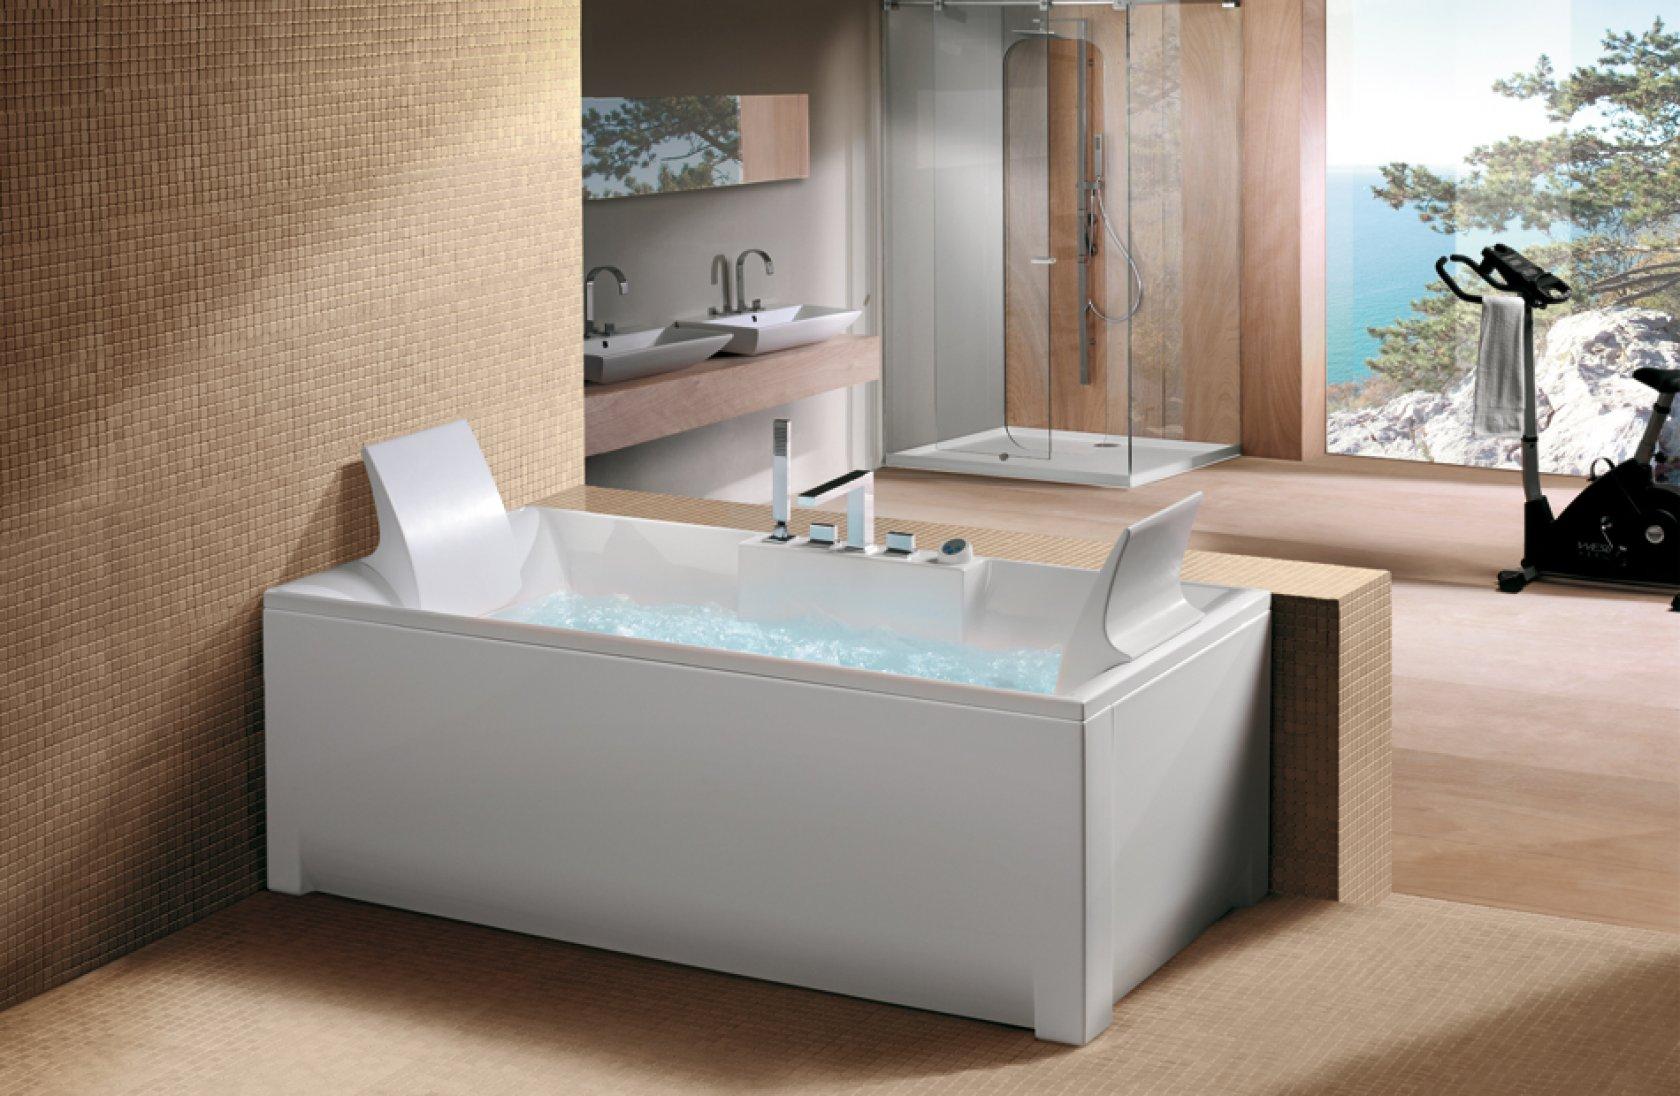 Vasca Da Bagno 170x70 Prezzo.Blubleu Vasche Da Bagno Vasche Da Bagno Edilceramiche Di Maccano